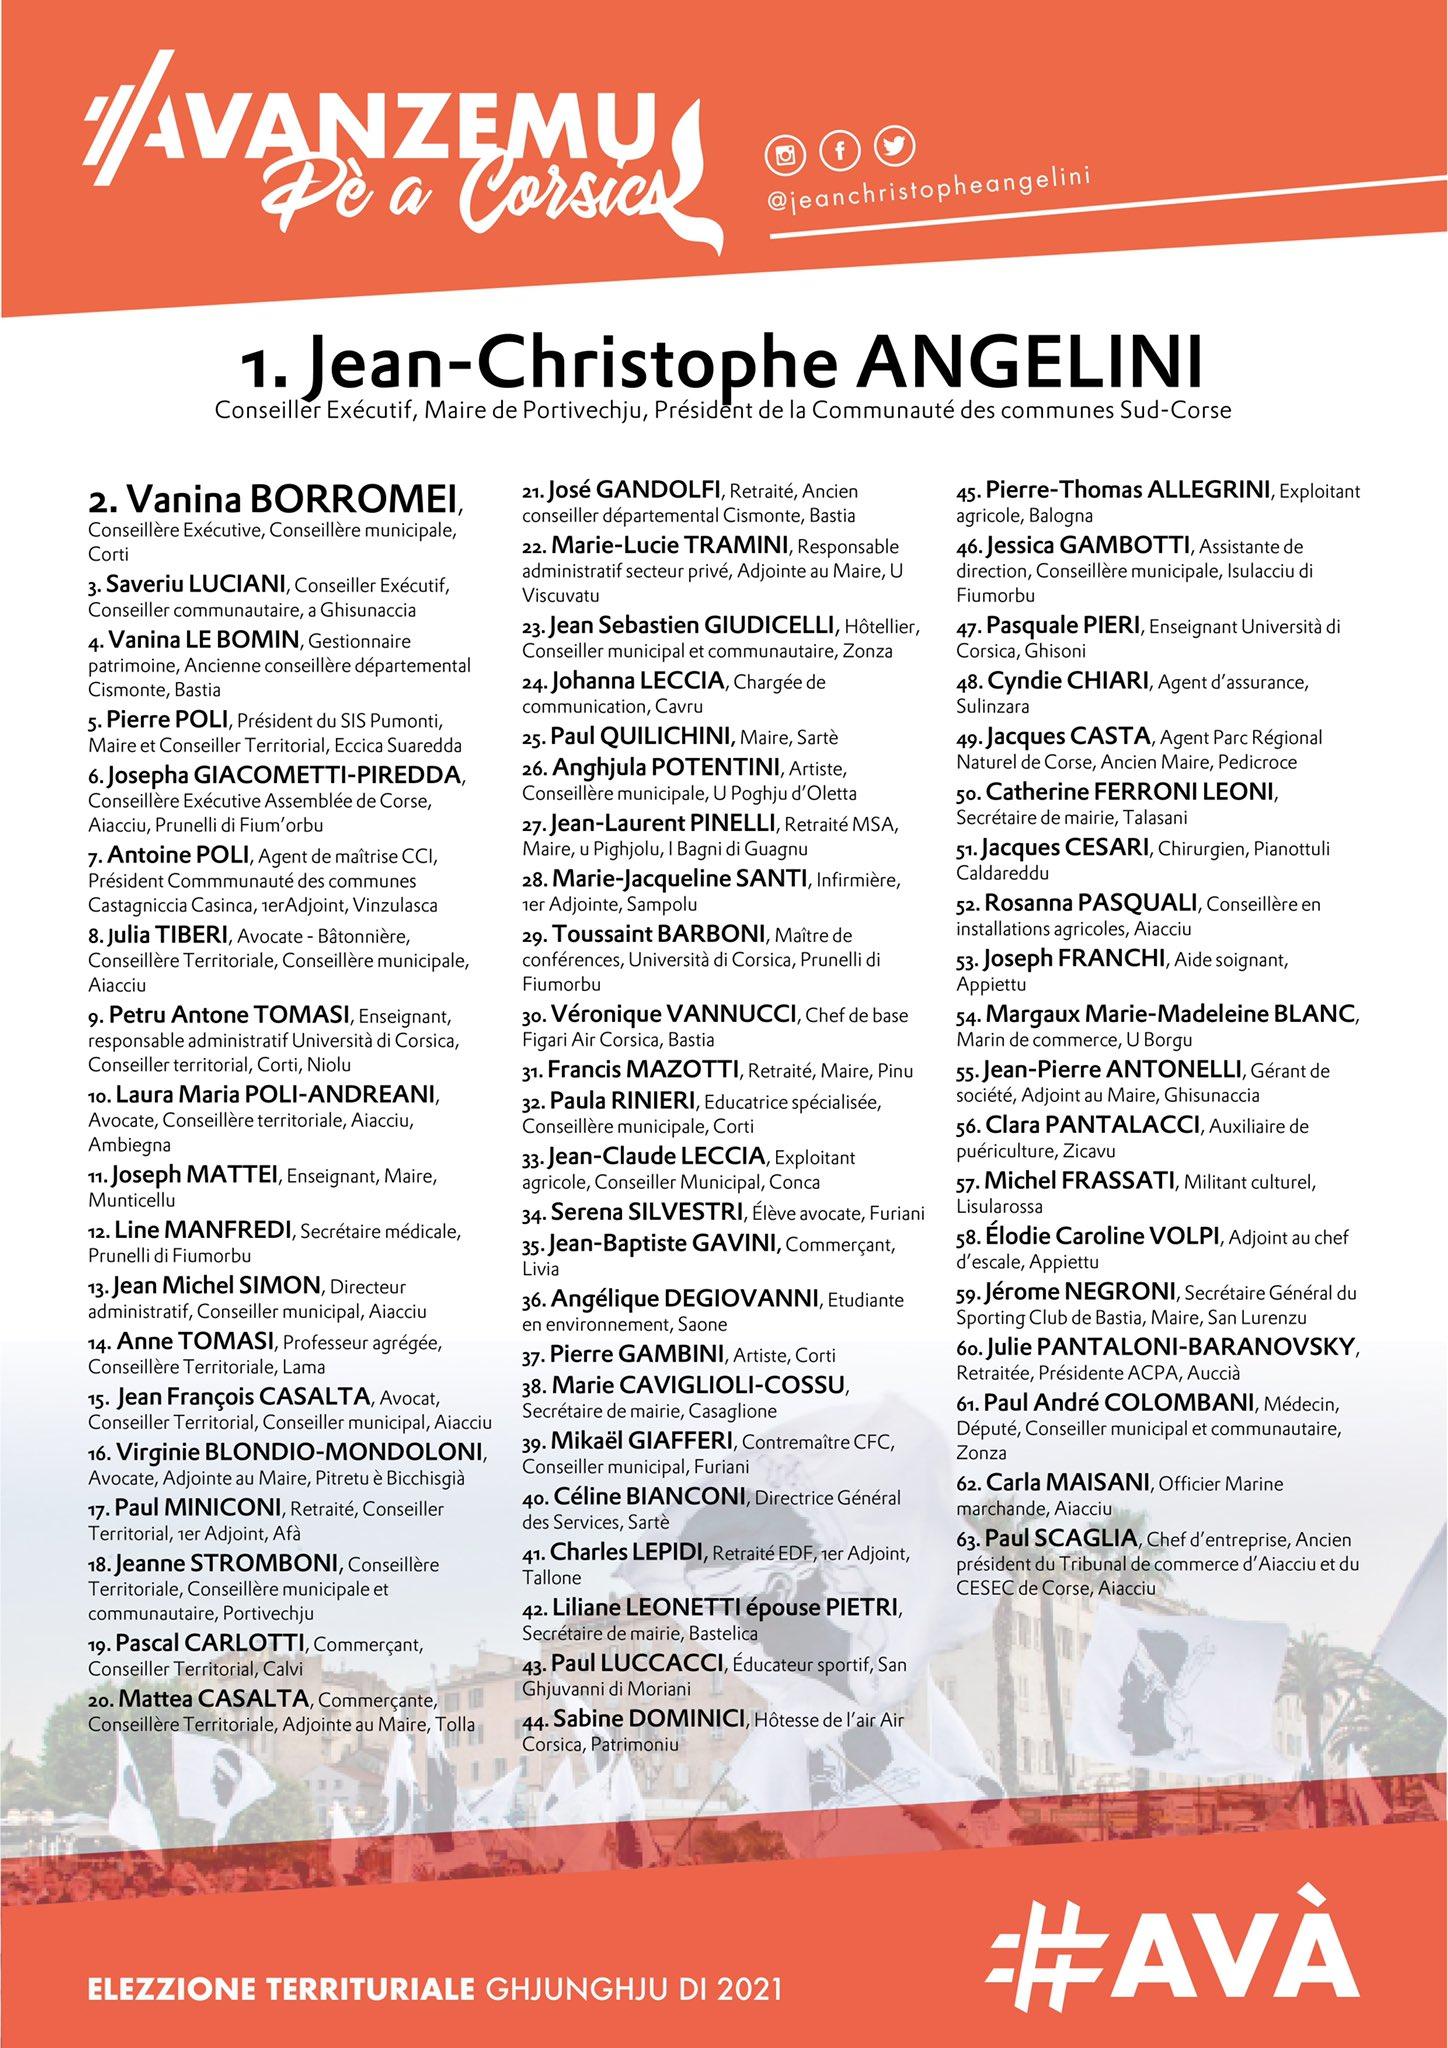 Territoriales : les 63 noms de la liste Avanzemu pè a Corsica